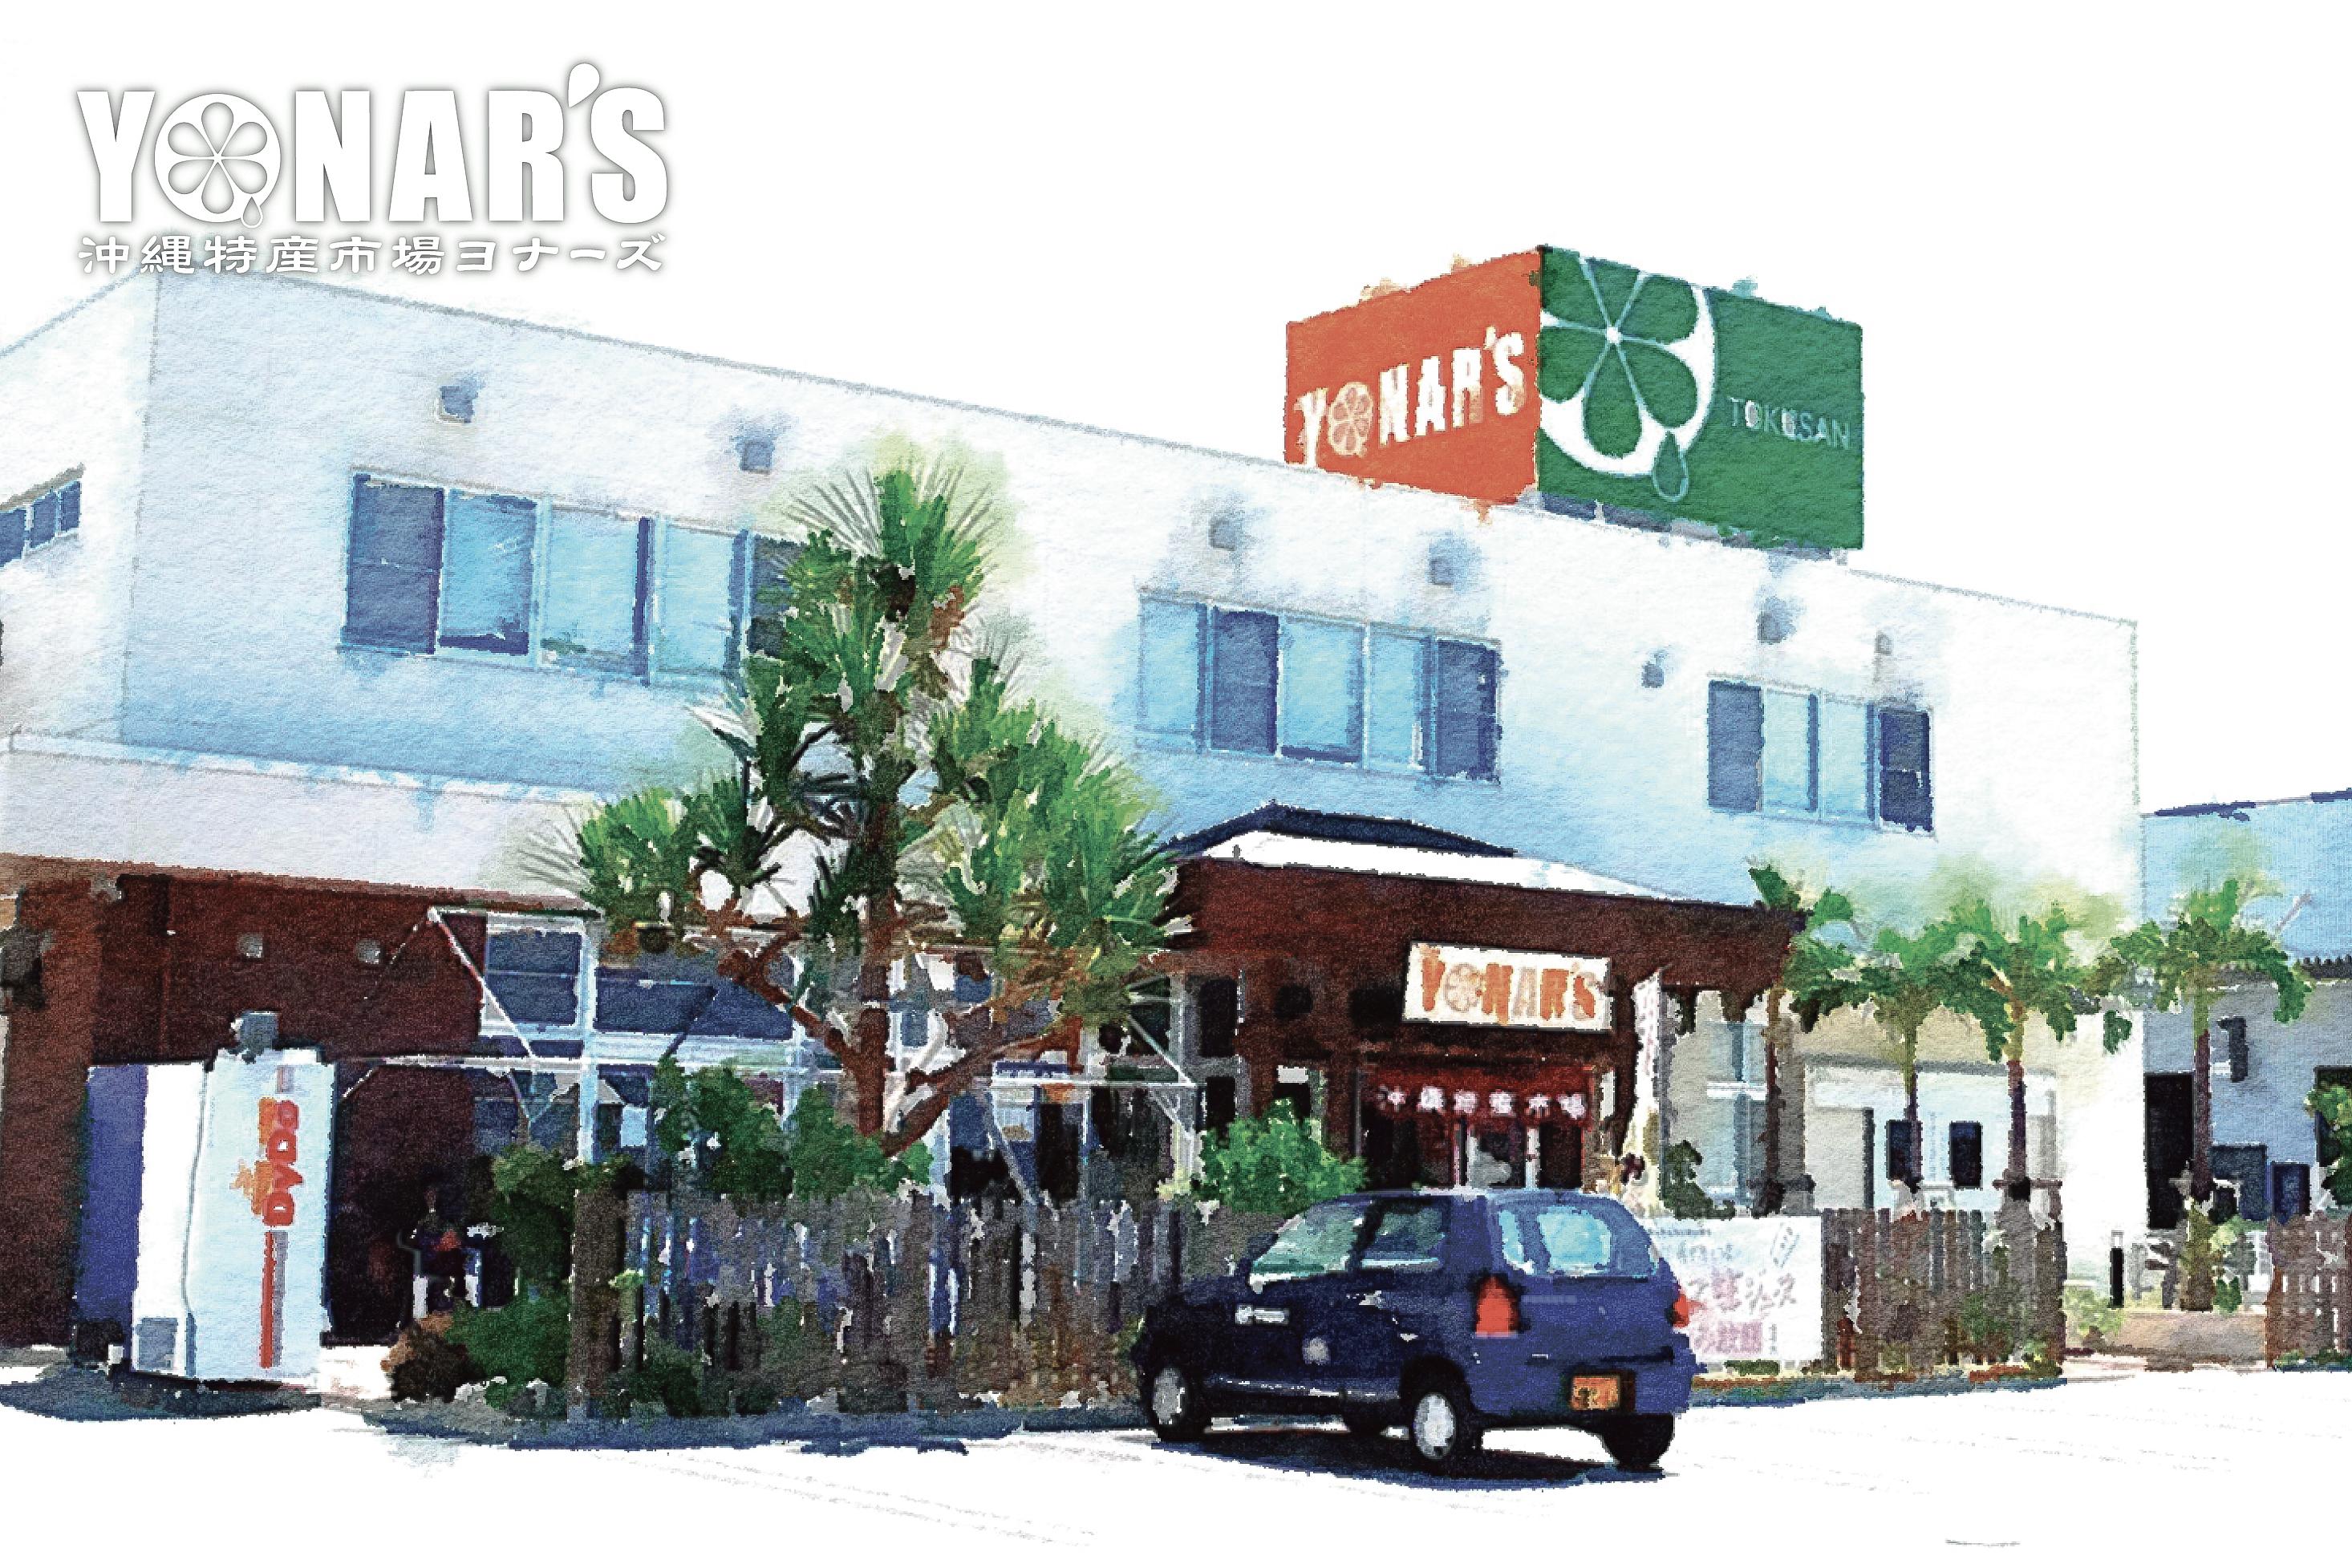 YONAR'S ショッピングサイト オープン!!